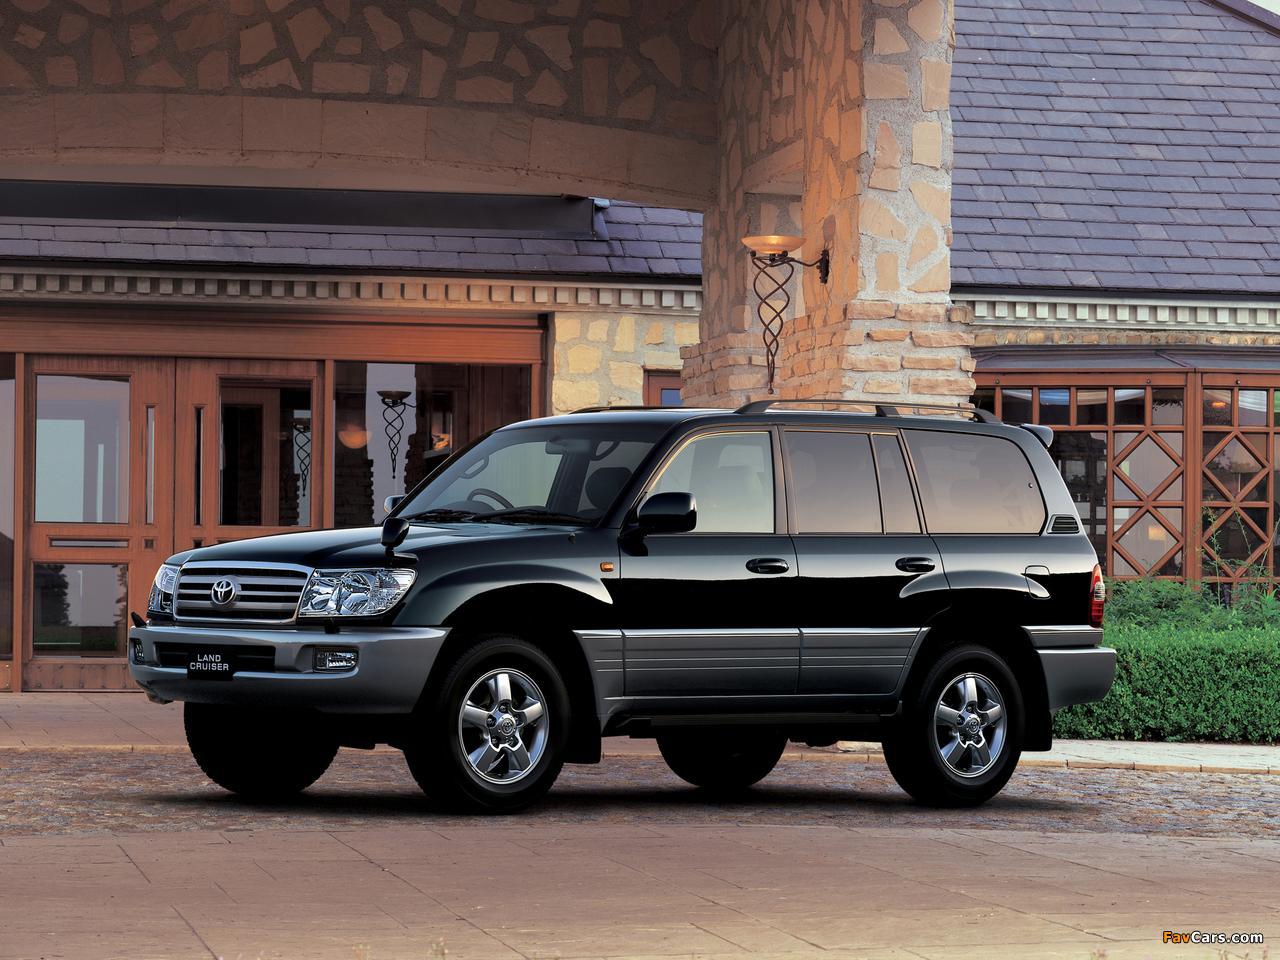 Toyota Land Cruiser 100 Wagon Vx Limited G Selection Touring Edition Jp Spec Uzj100w 2005 07